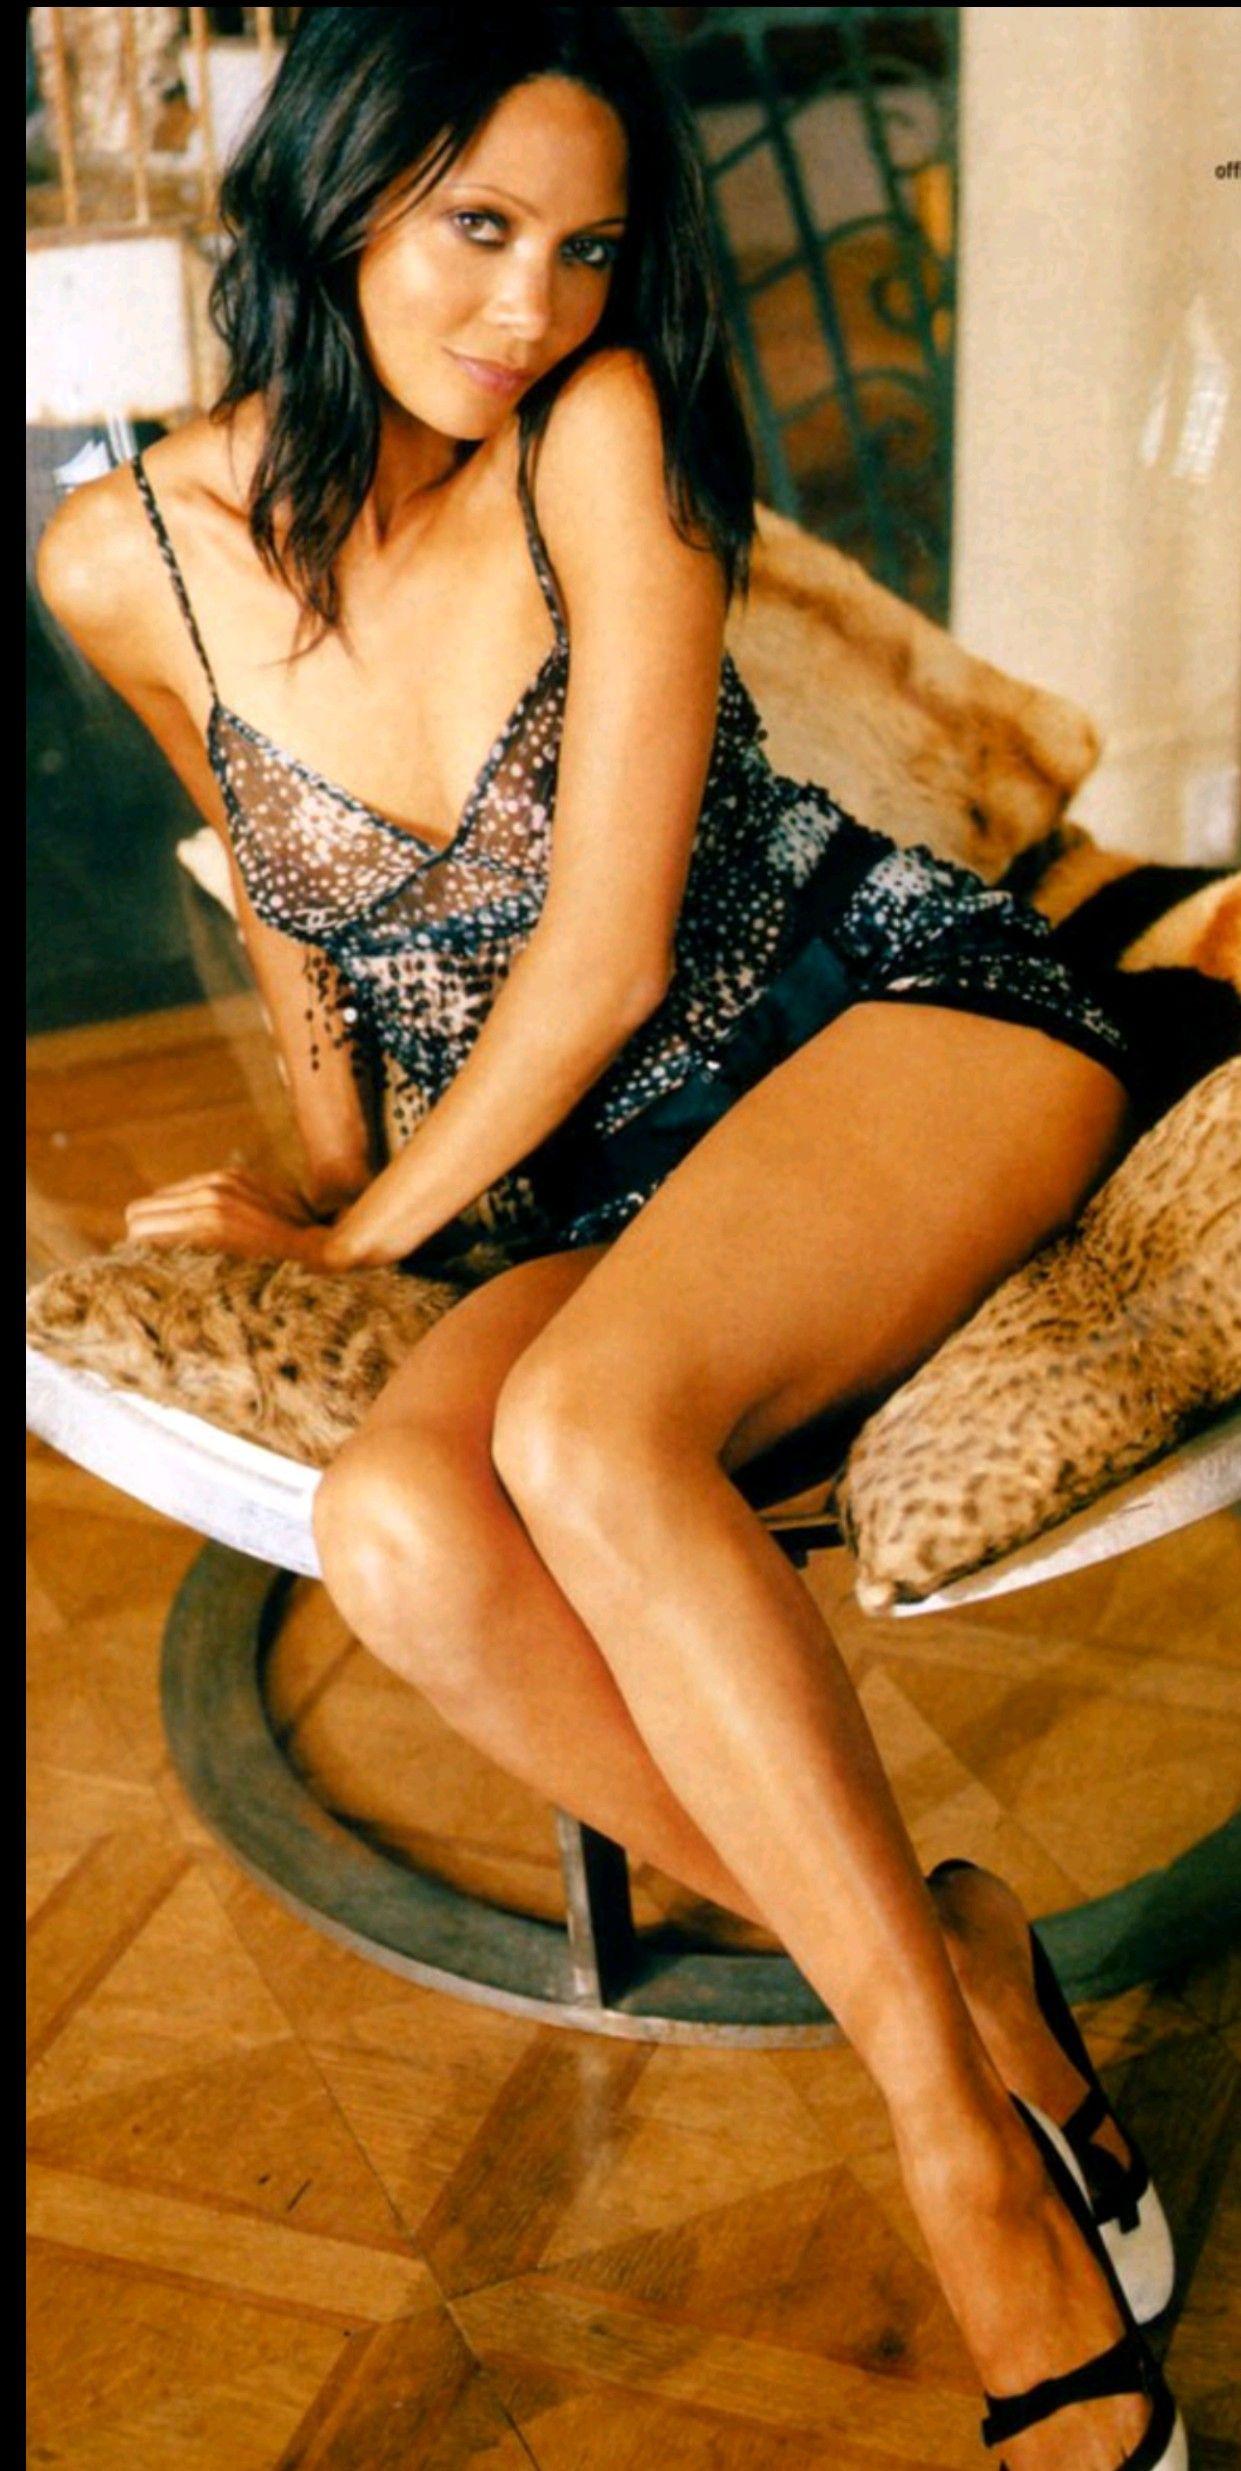 Hot Thandie Newton nudes (57 foto and video), Pussy, Bikini, Selfie, lingerie 2006